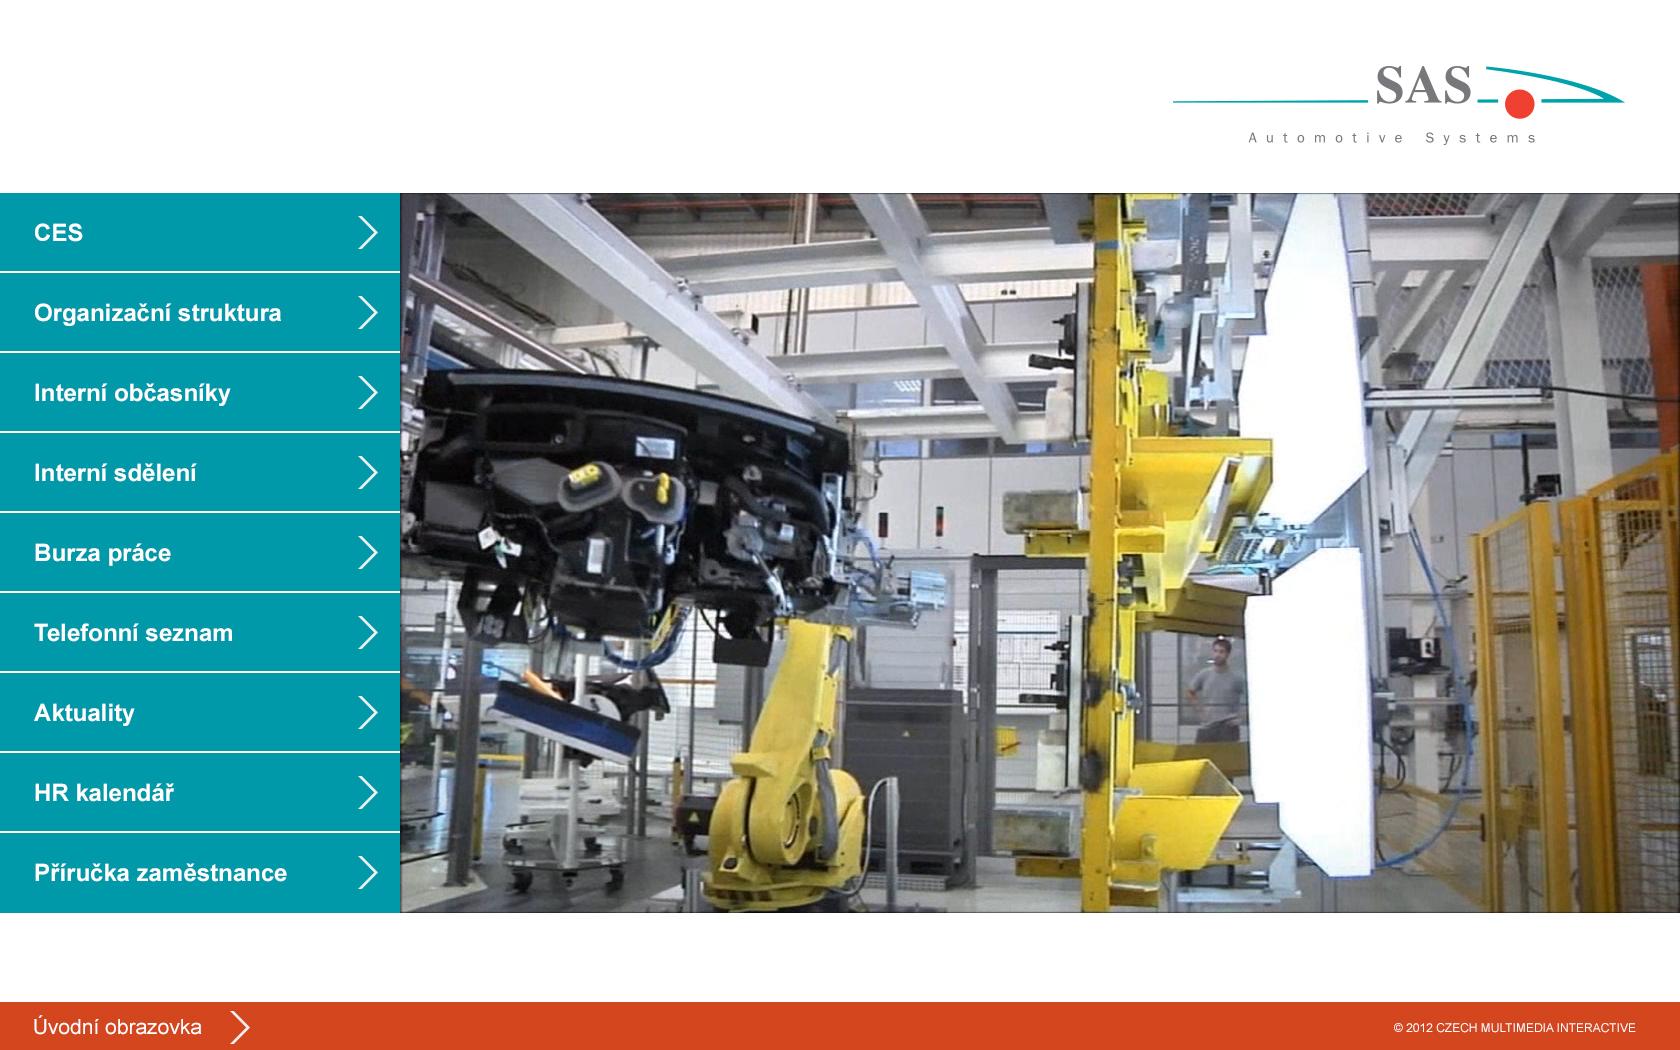 Kiosek a software SAS Automotive 5